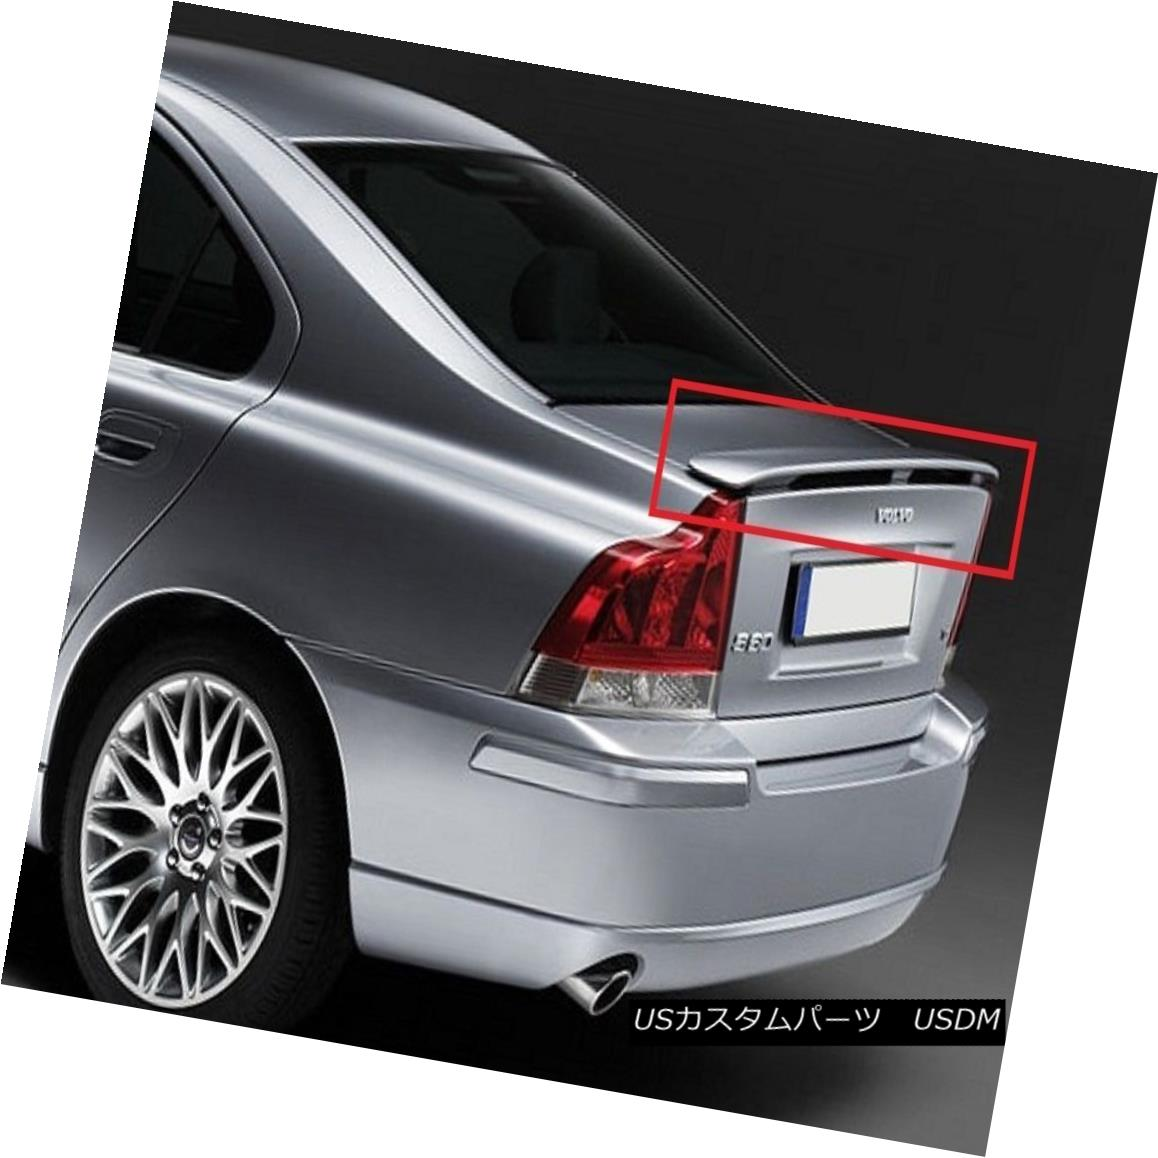 2006-2007 Subaru Impreza Front Bumper Tow Hook Eye Cap Cover WRX 55552FE010 OEM